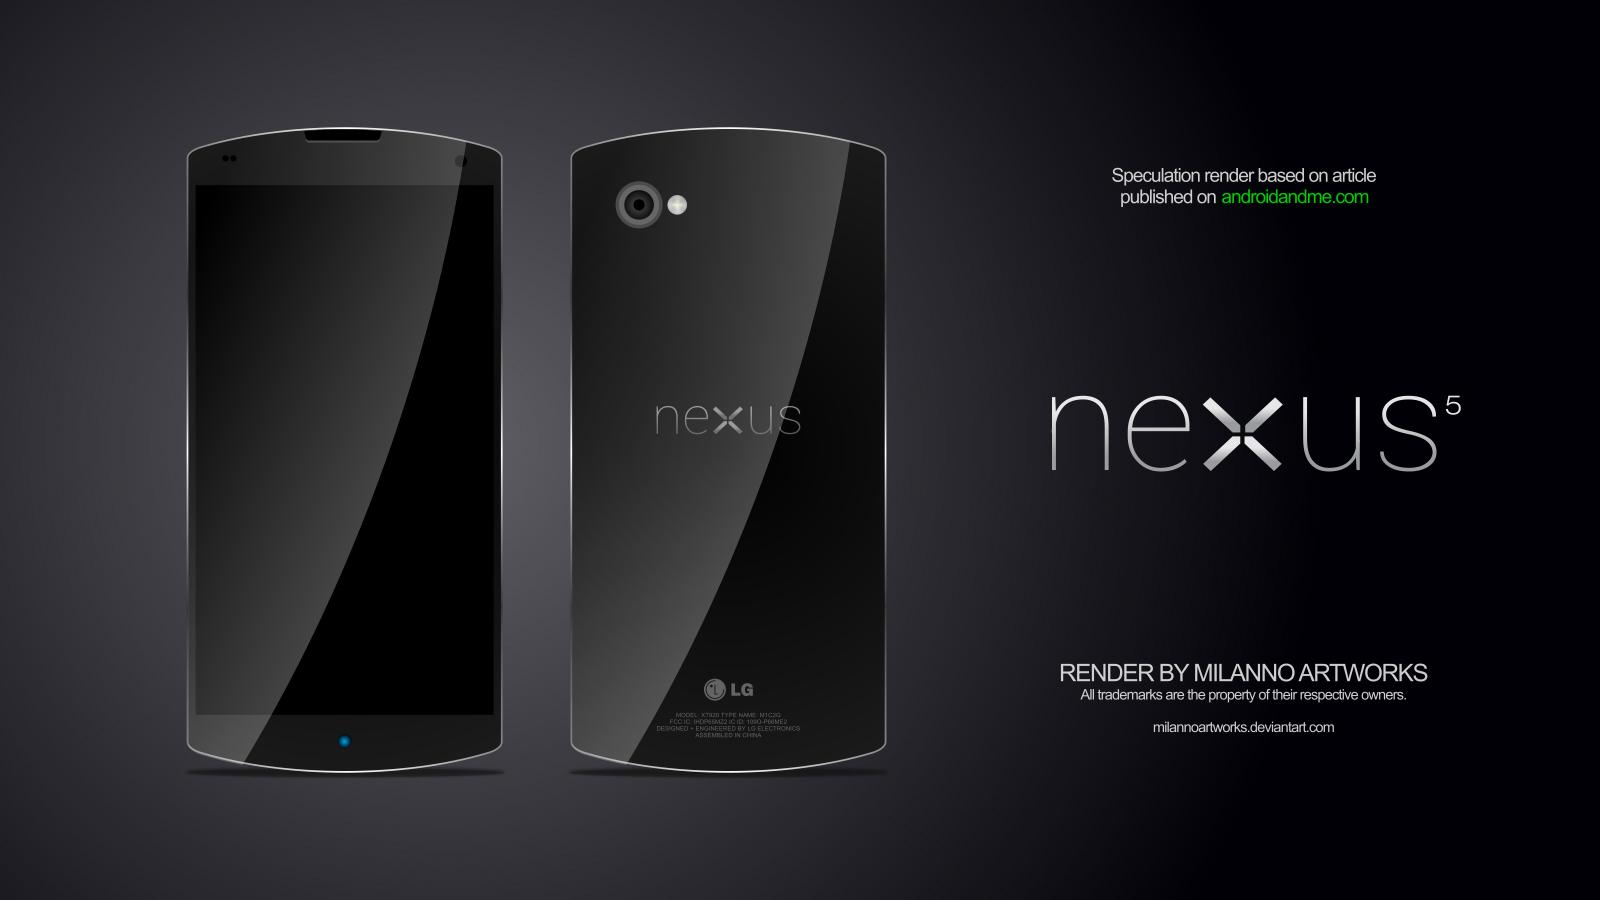 lg_nexus_5